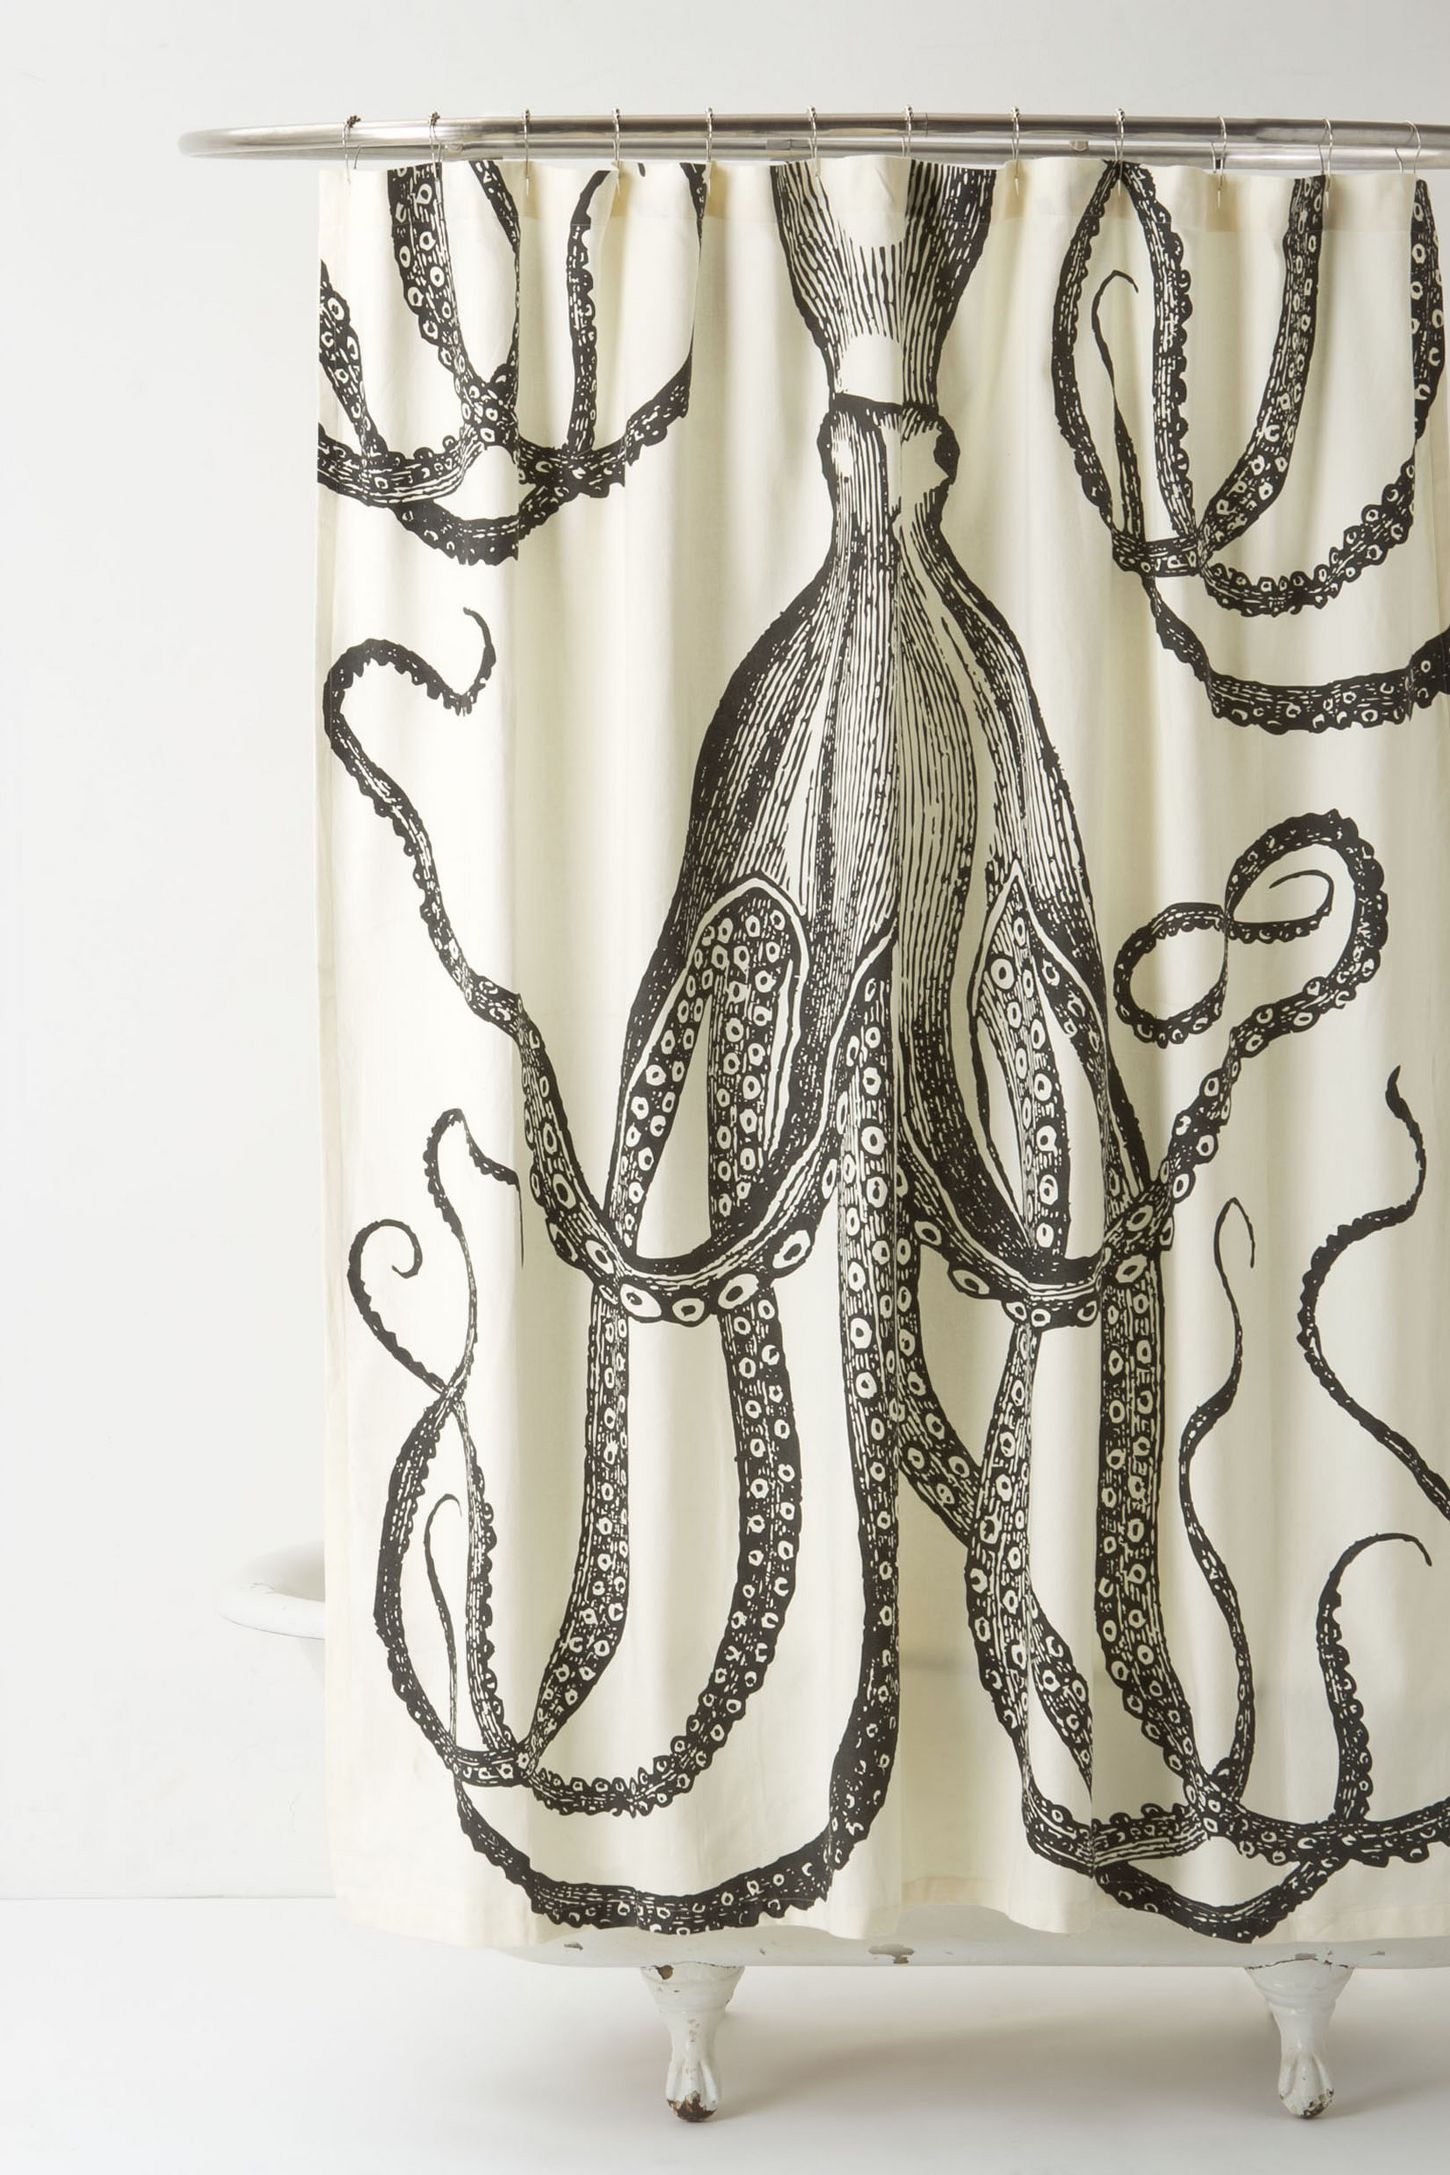 Anthropologie floral shower curtain - Anthropologie Floral Shower Curtain 45